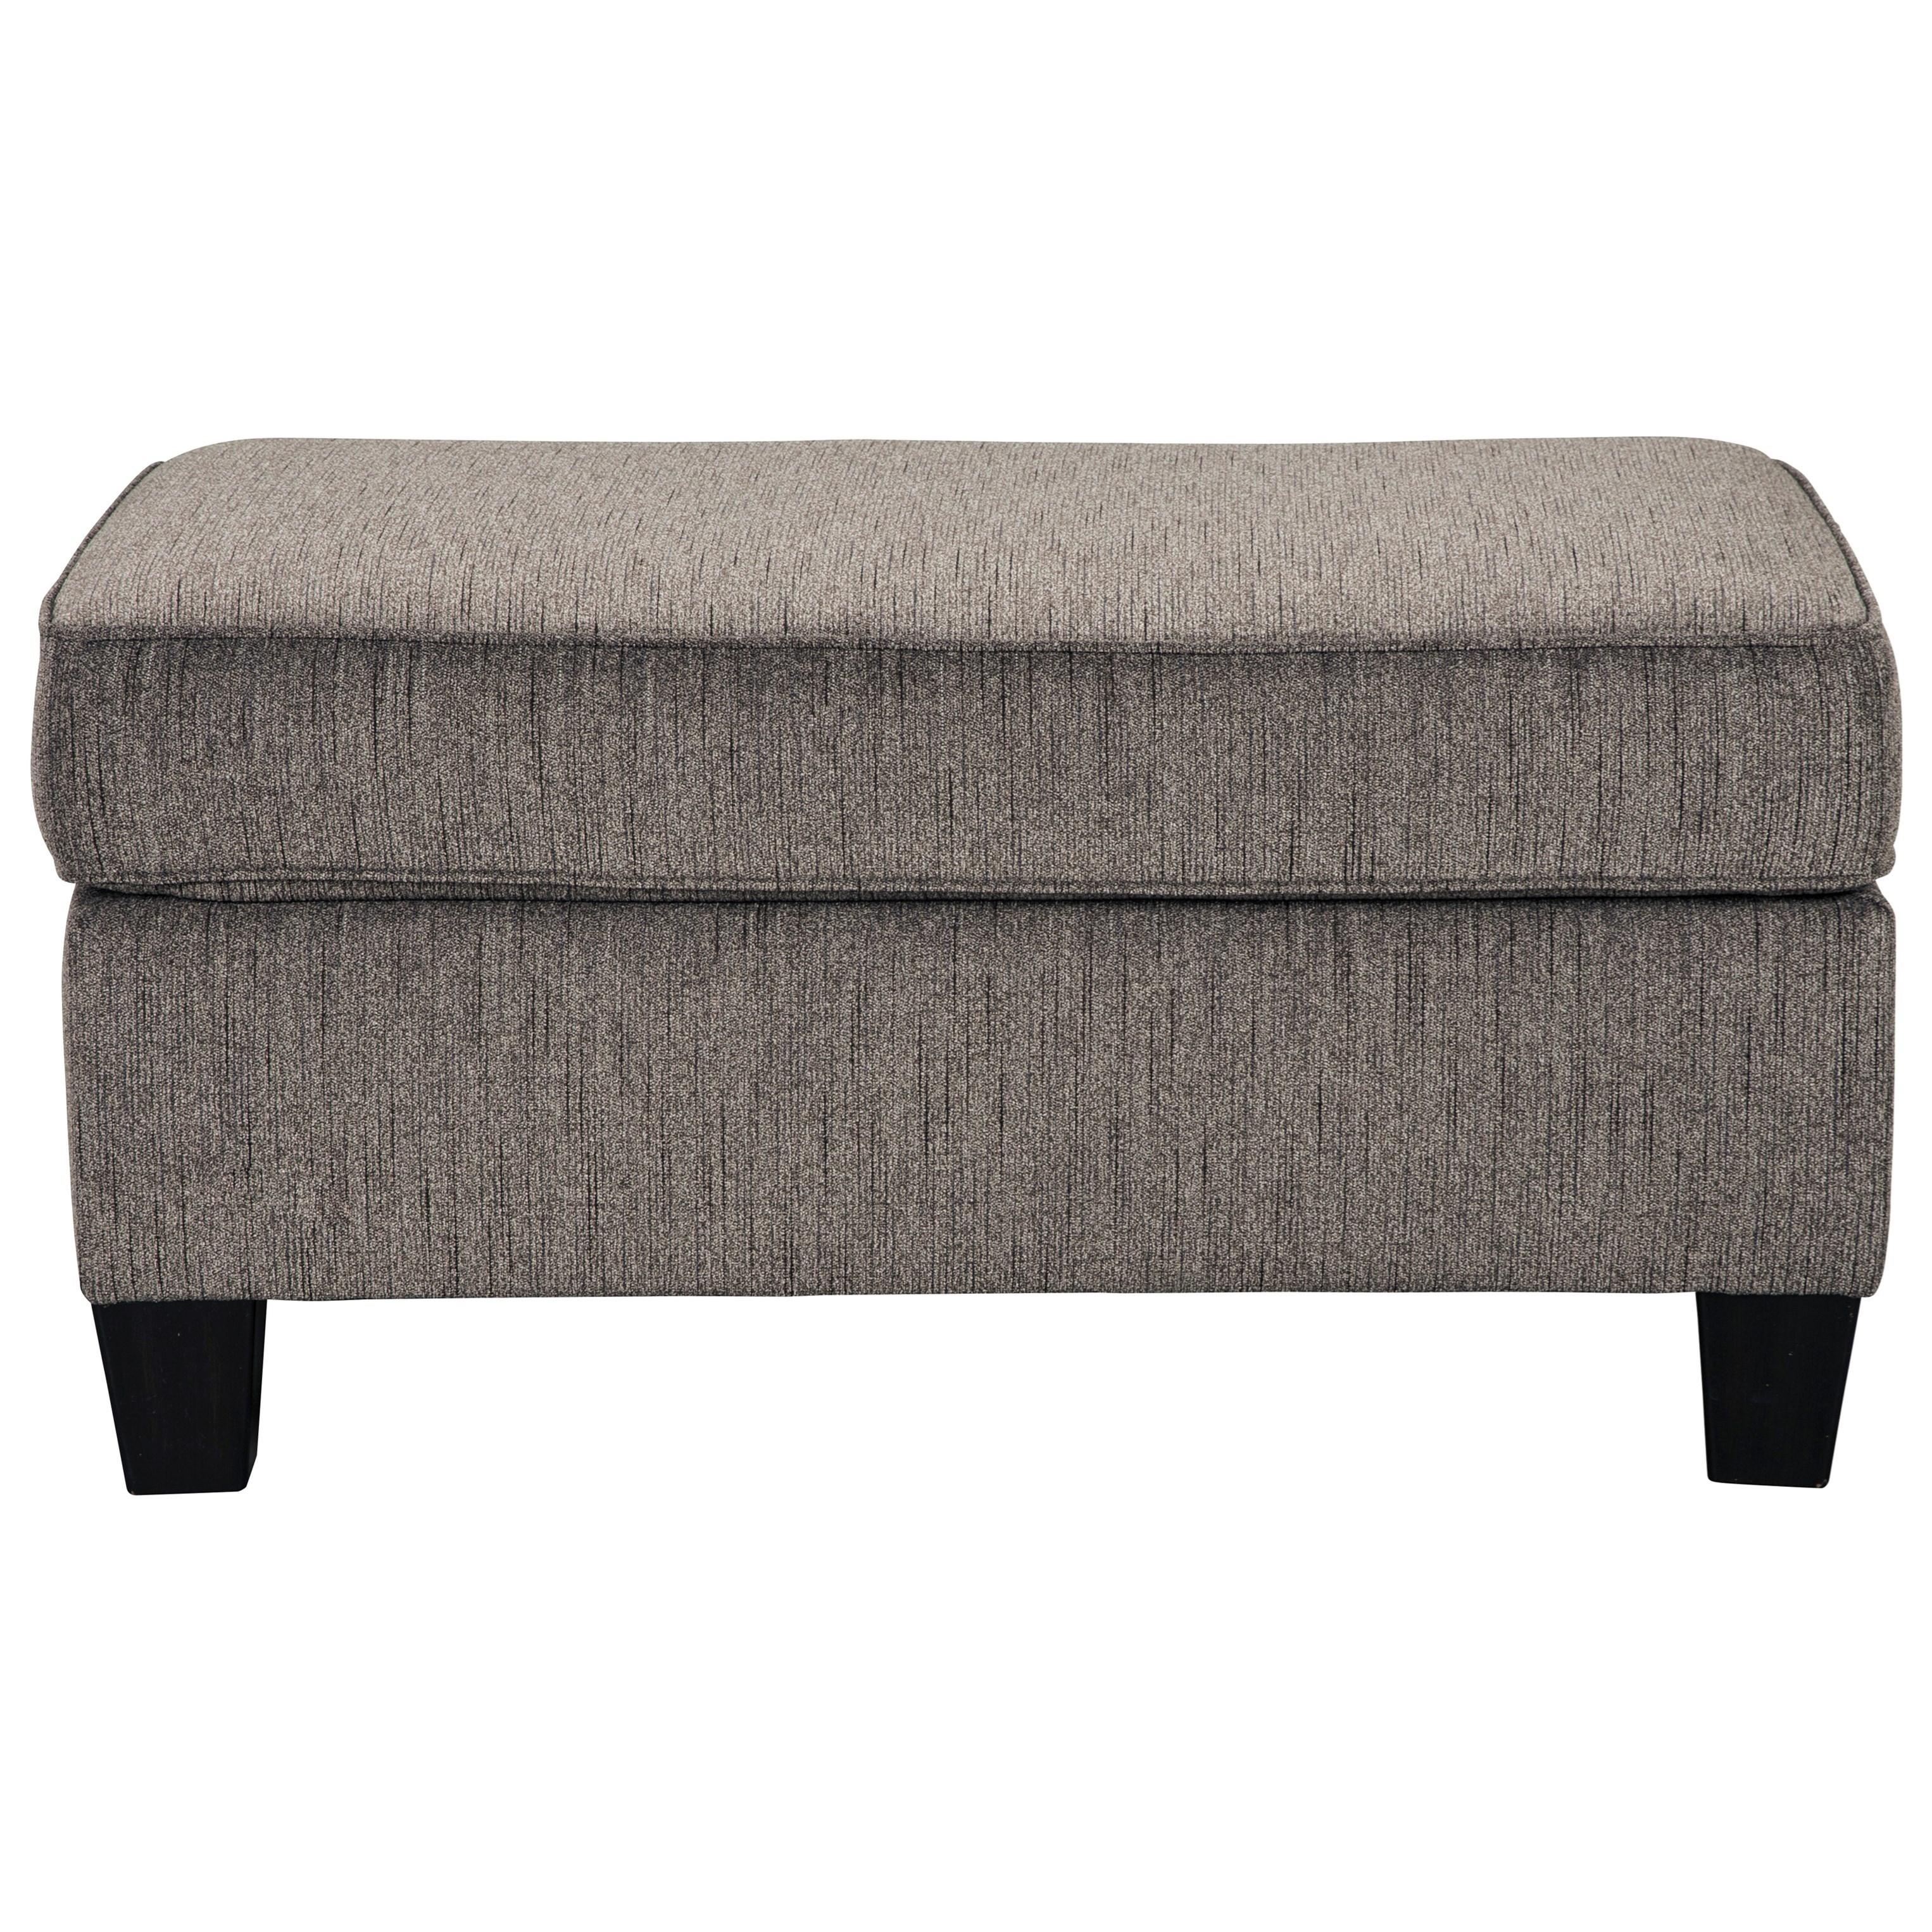 Nemoli Ottoman by Signature Design by Ashley at HomeWorld Furniture